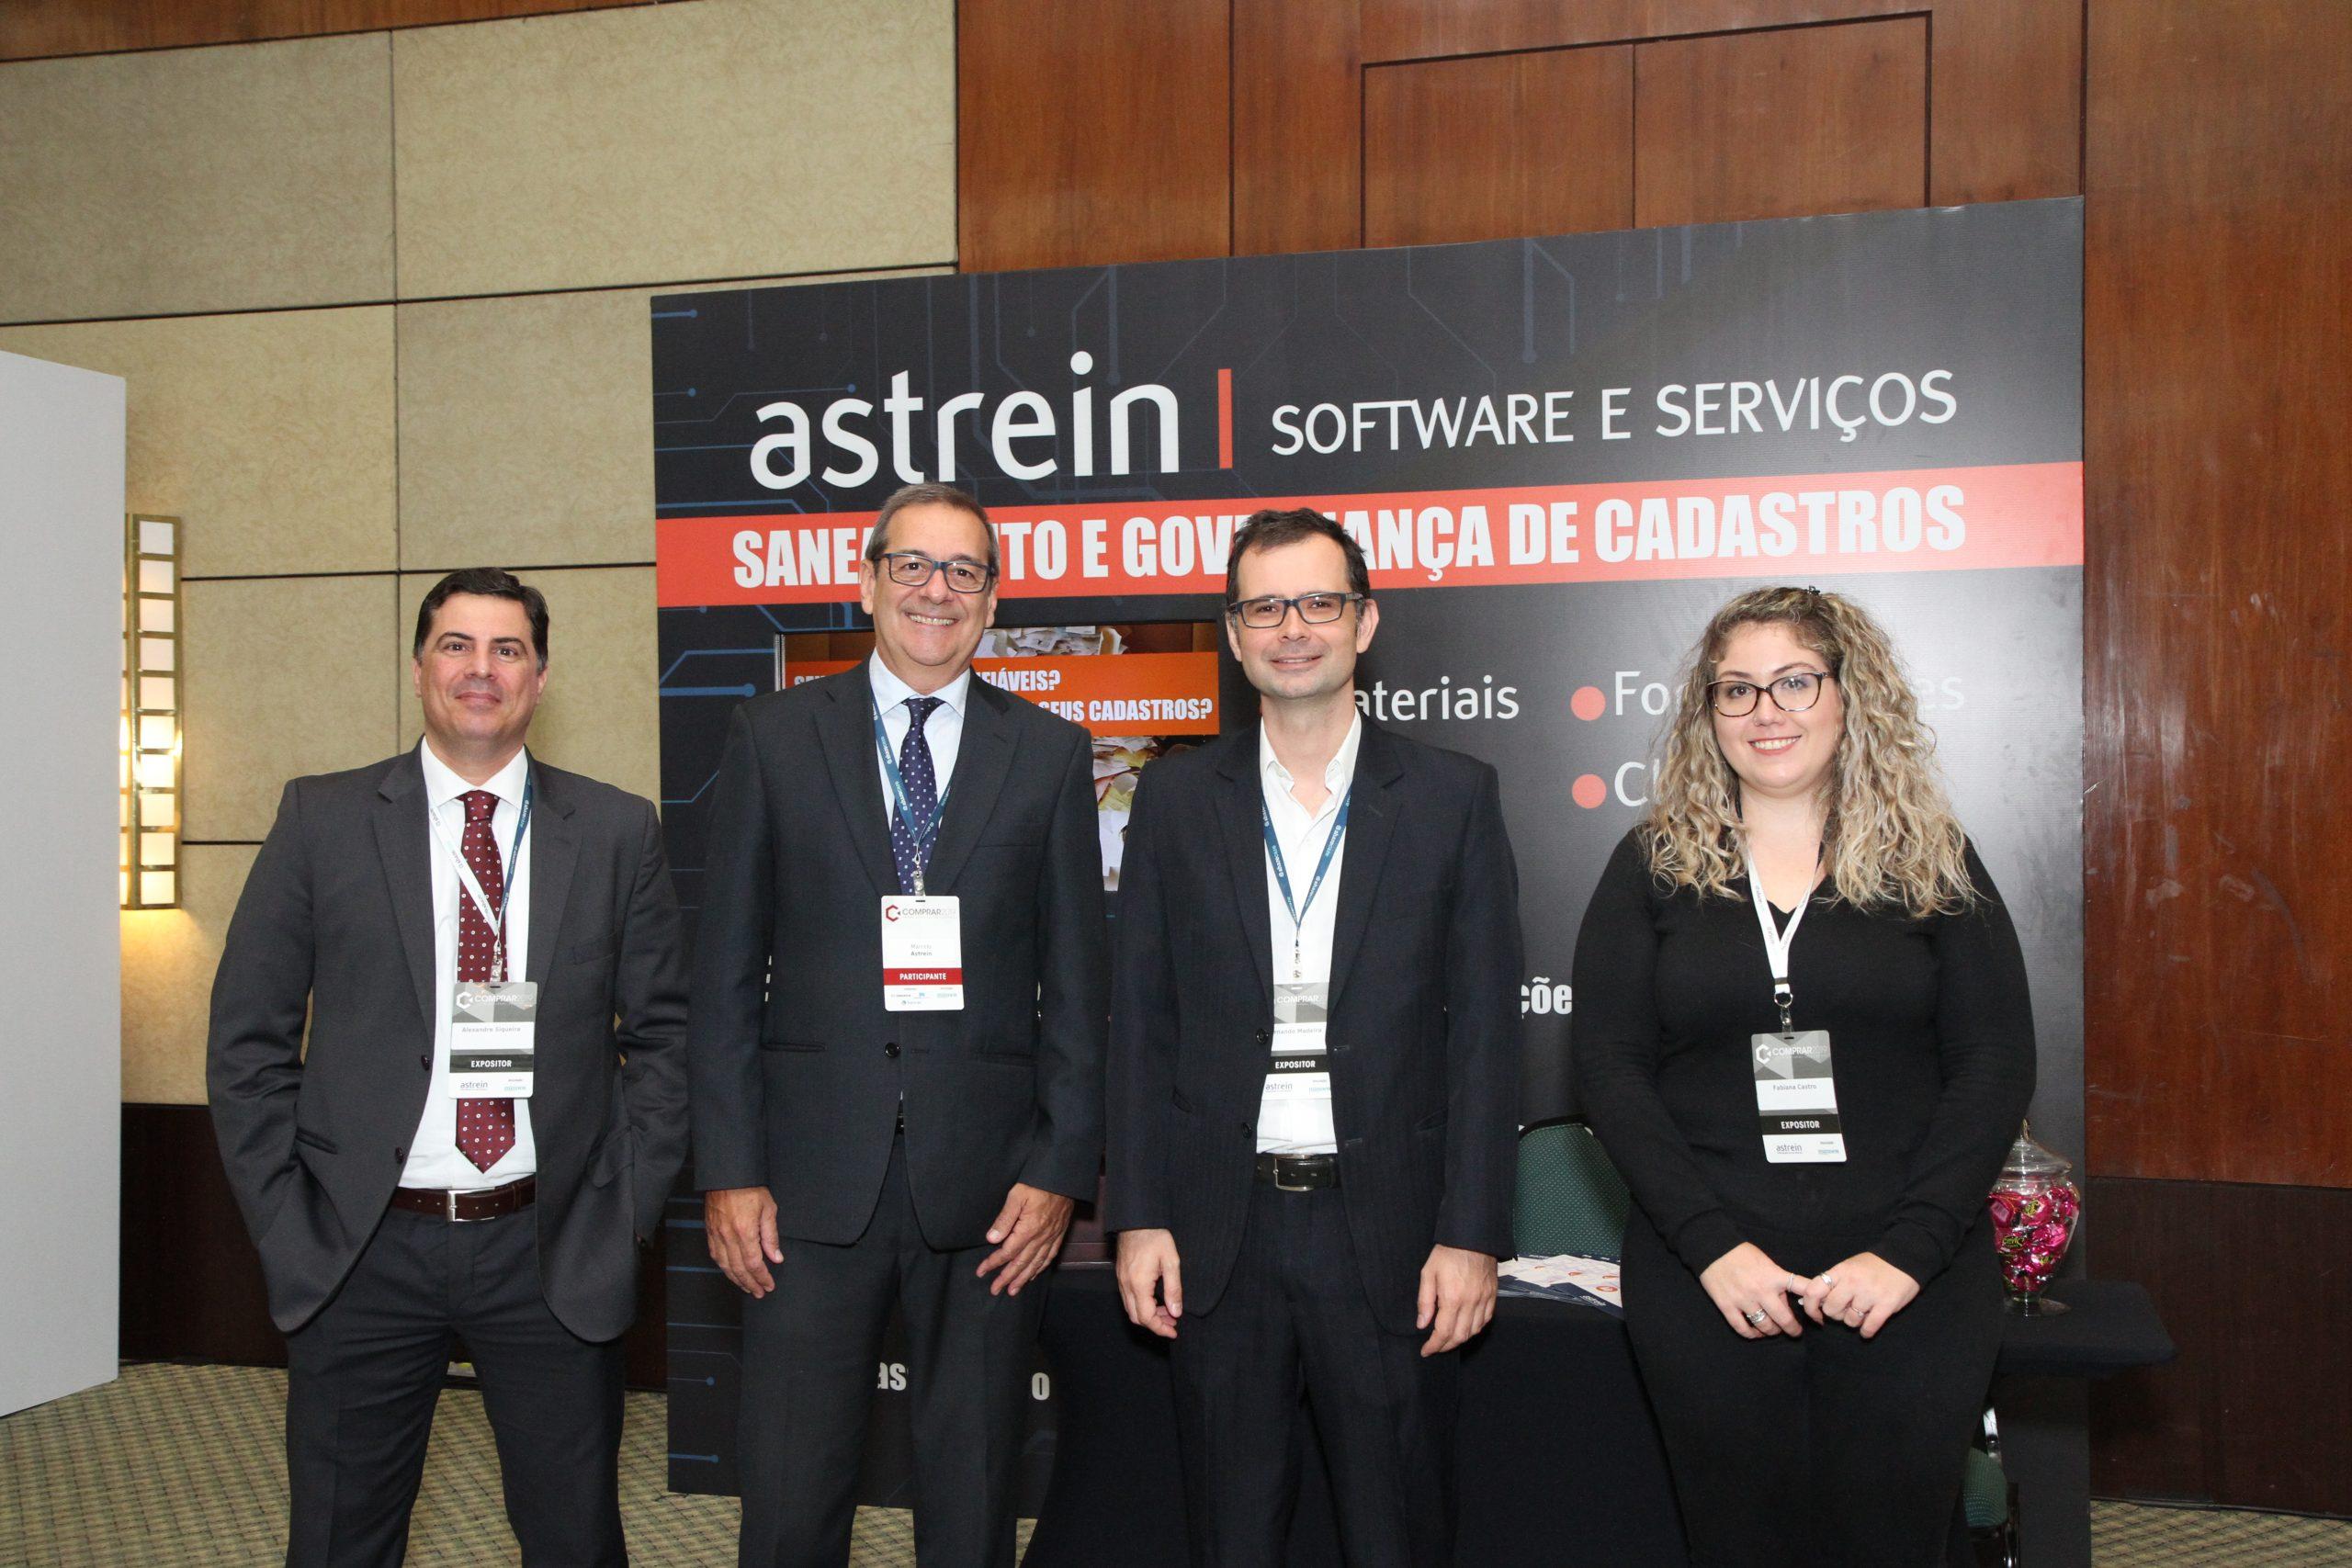 Astrein no Comprar 2019